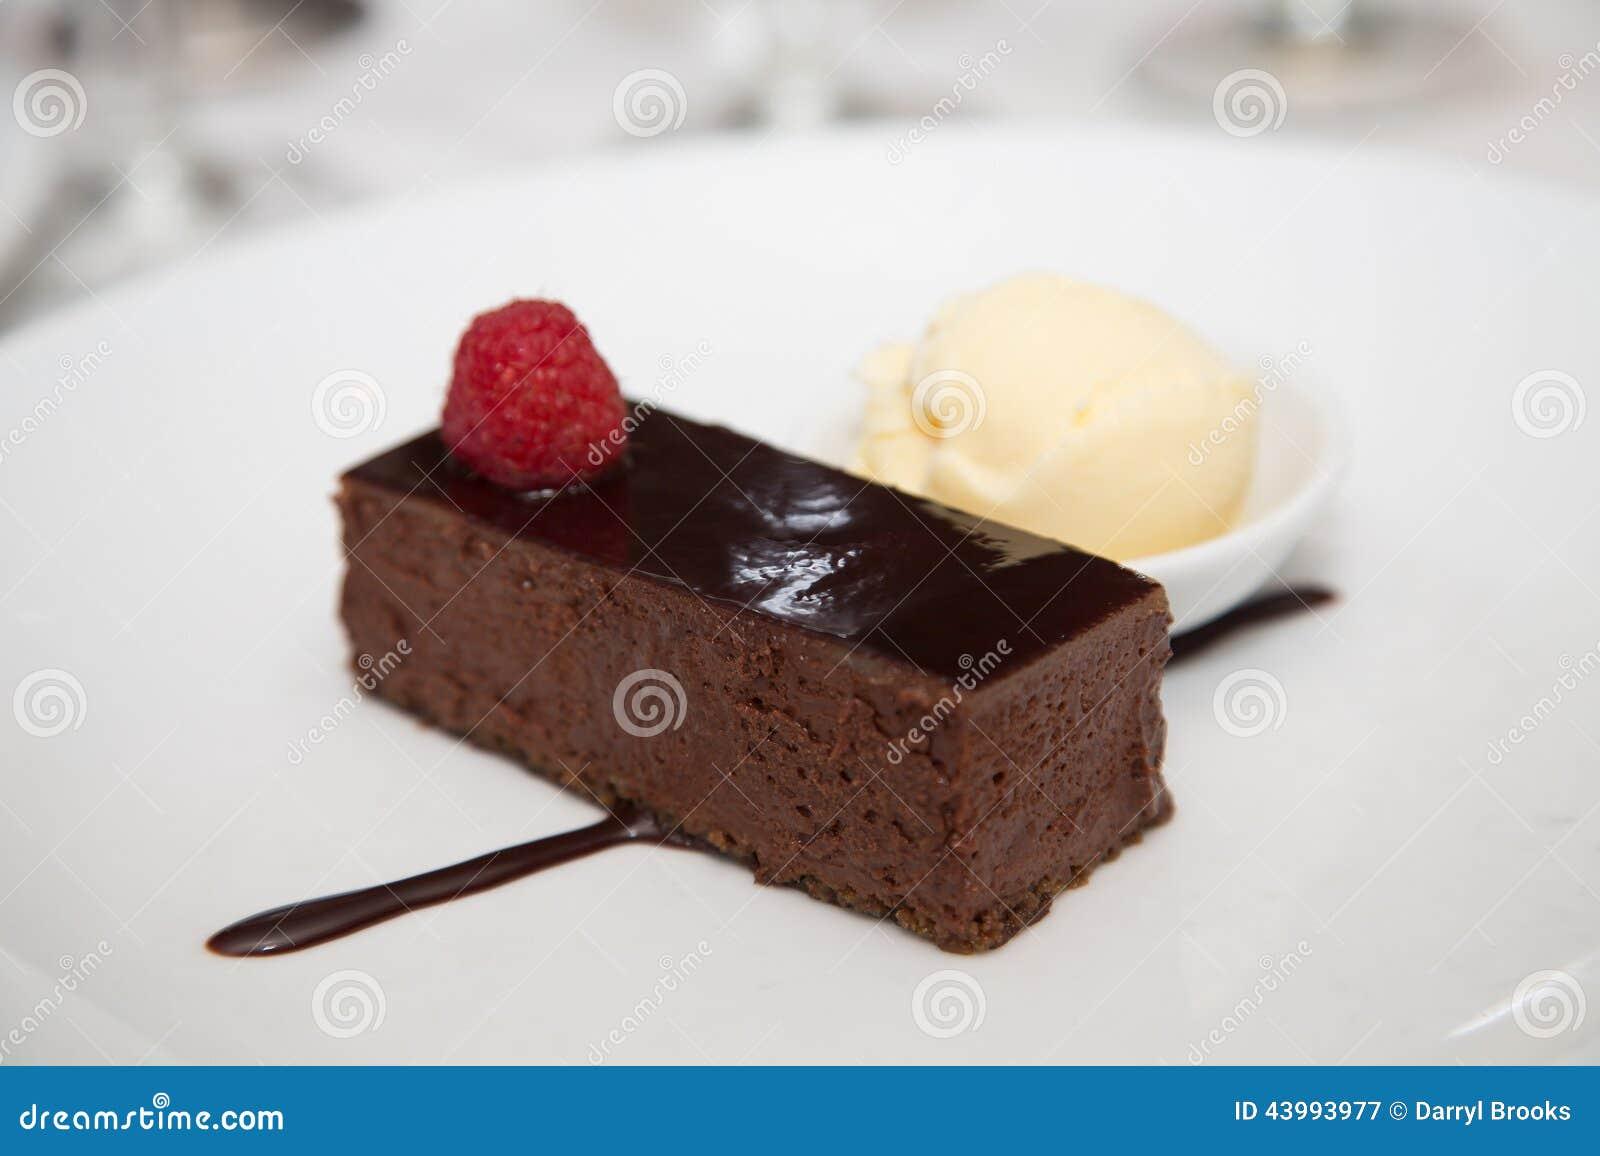 Chocolate Fudge Sauce For Cake